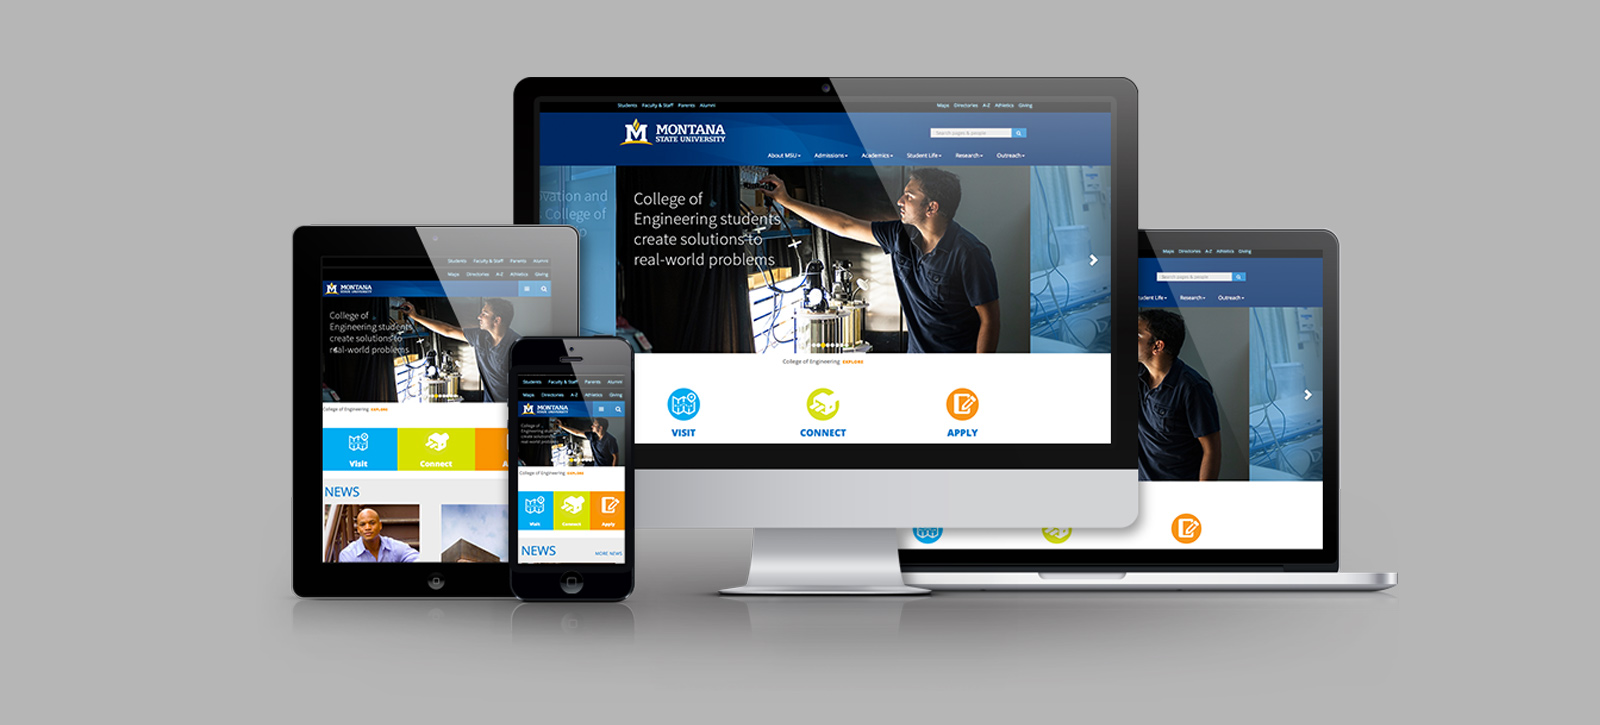 MSU Responsive Design